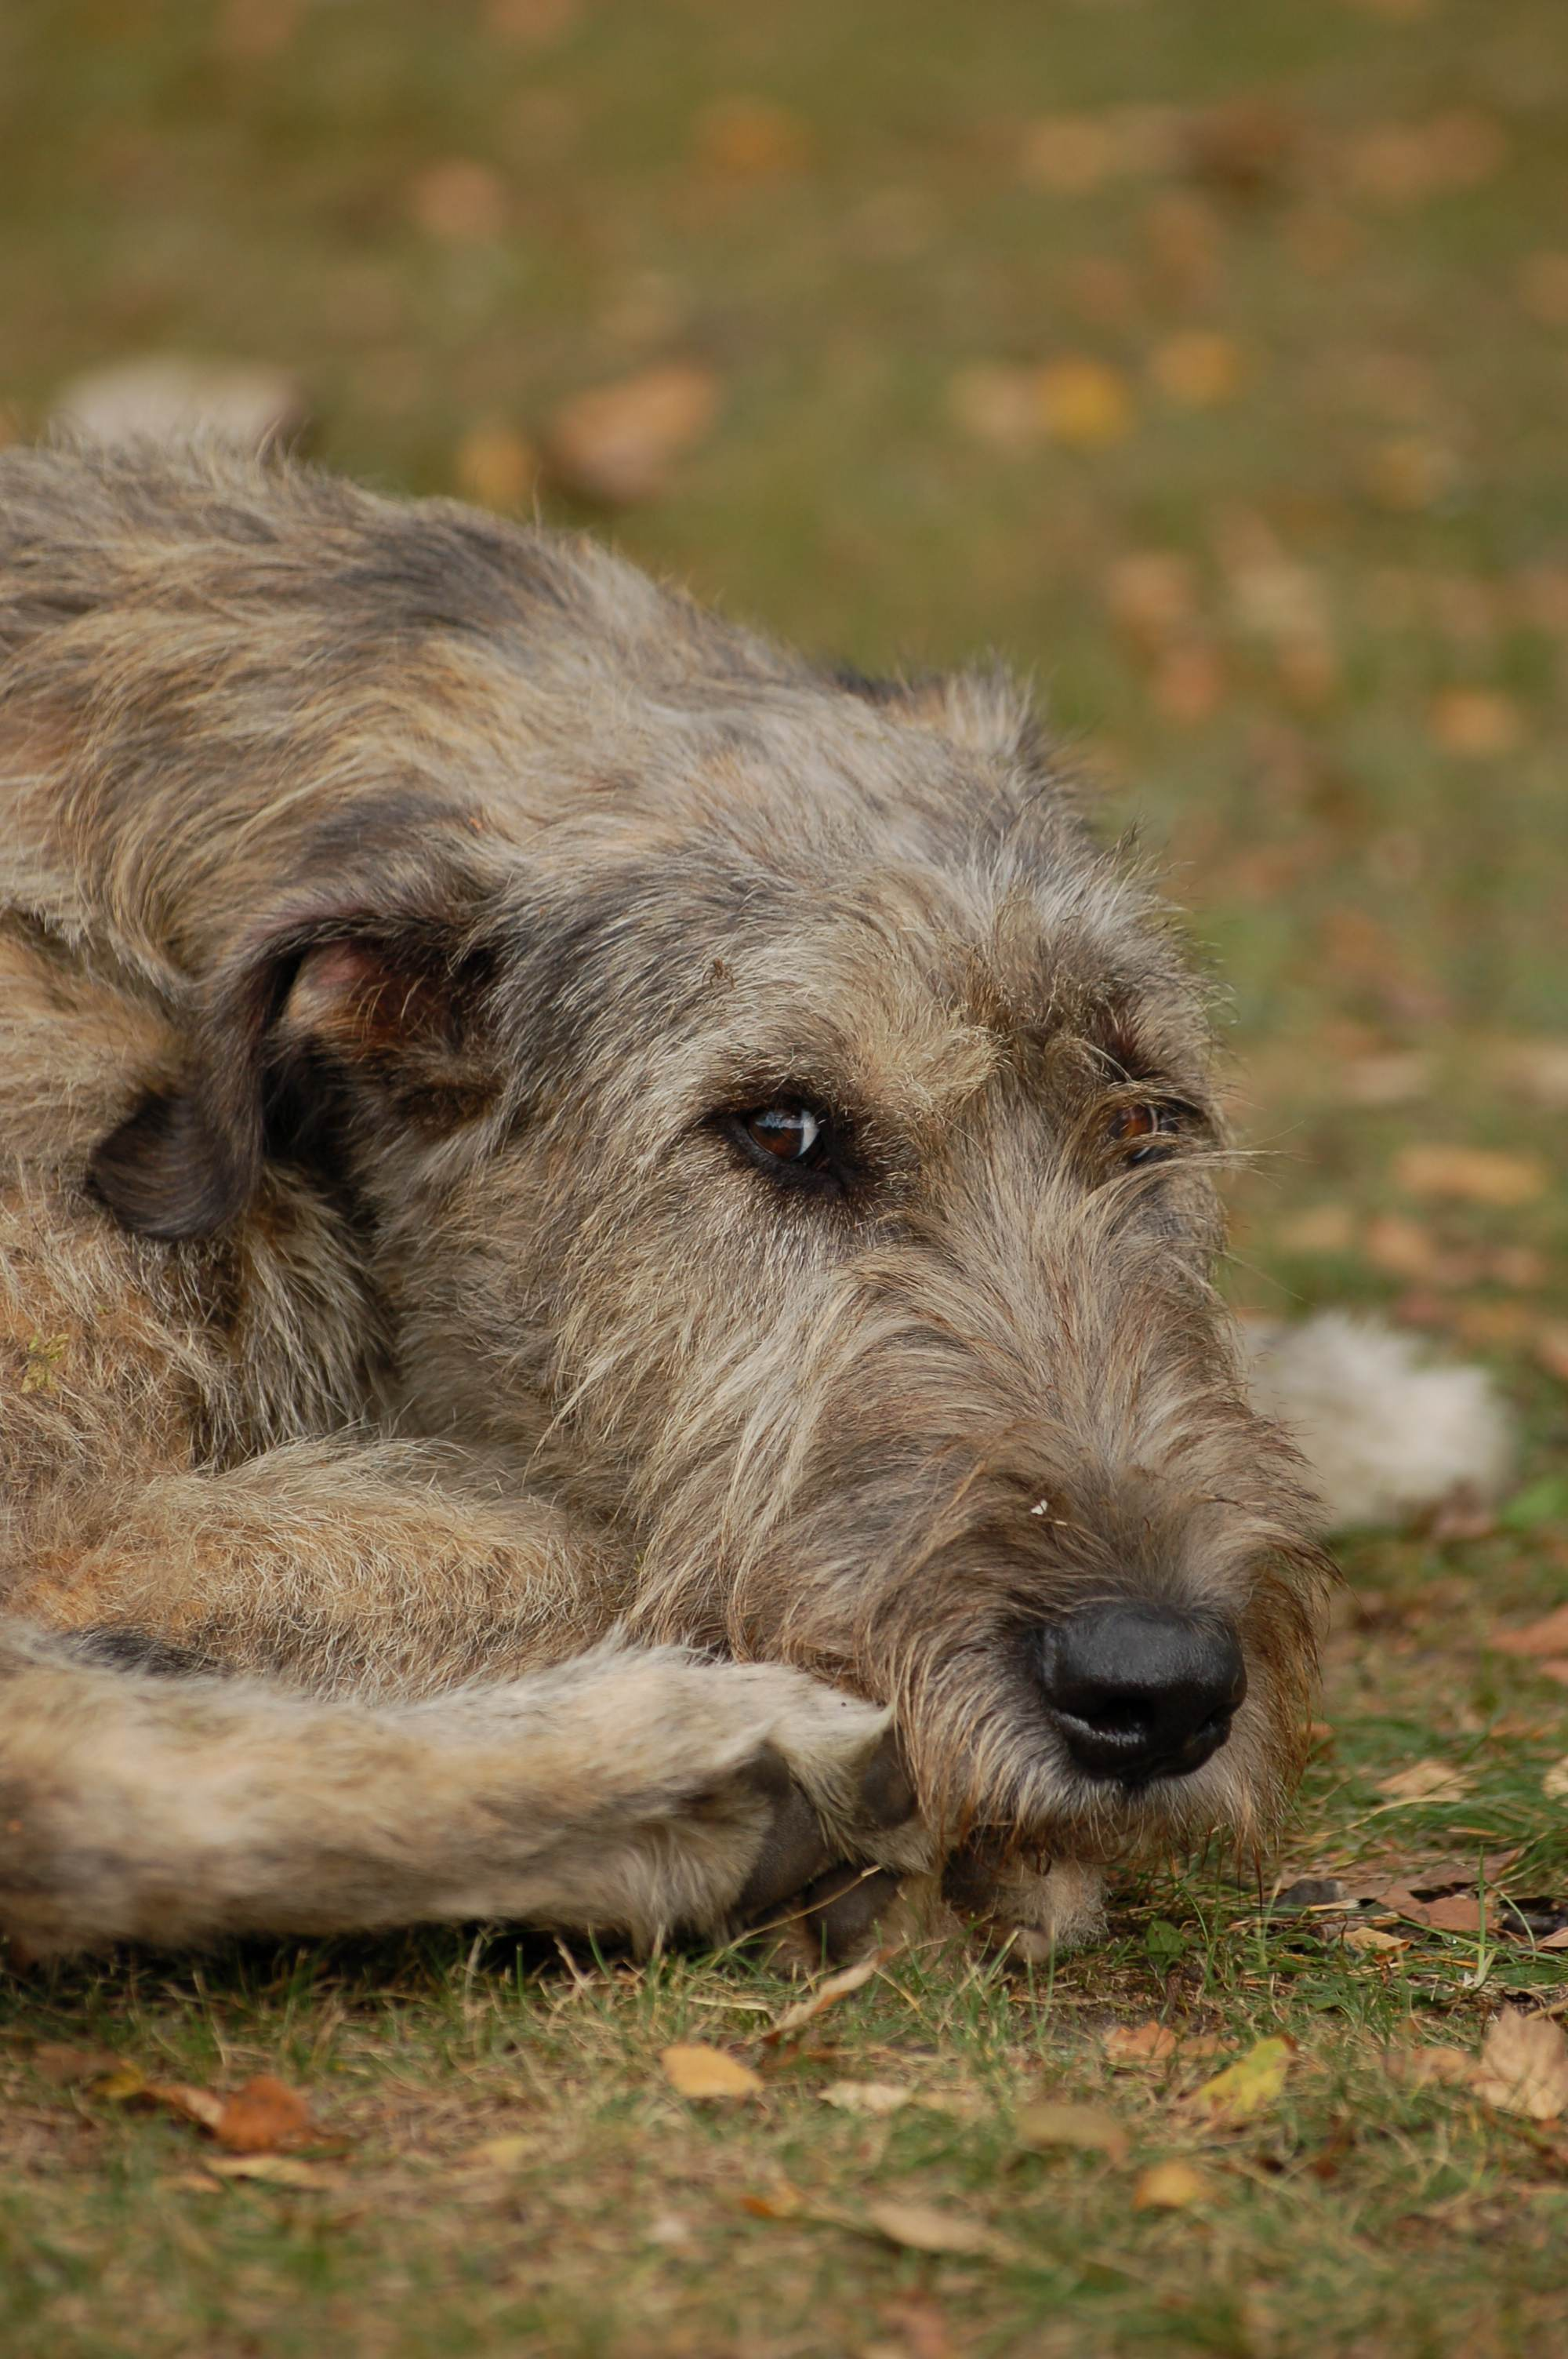 File:Irish Wolfhound 06.JPG - Wikimedia Commons